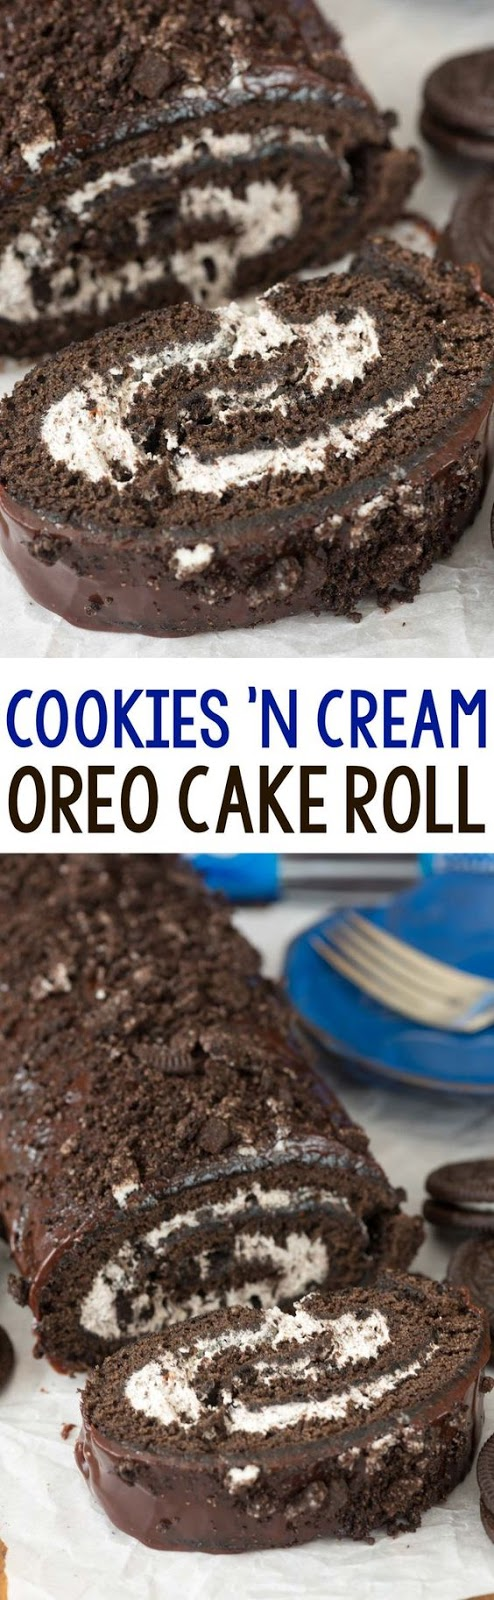 Cookies N Cream Oreo Cake Roll